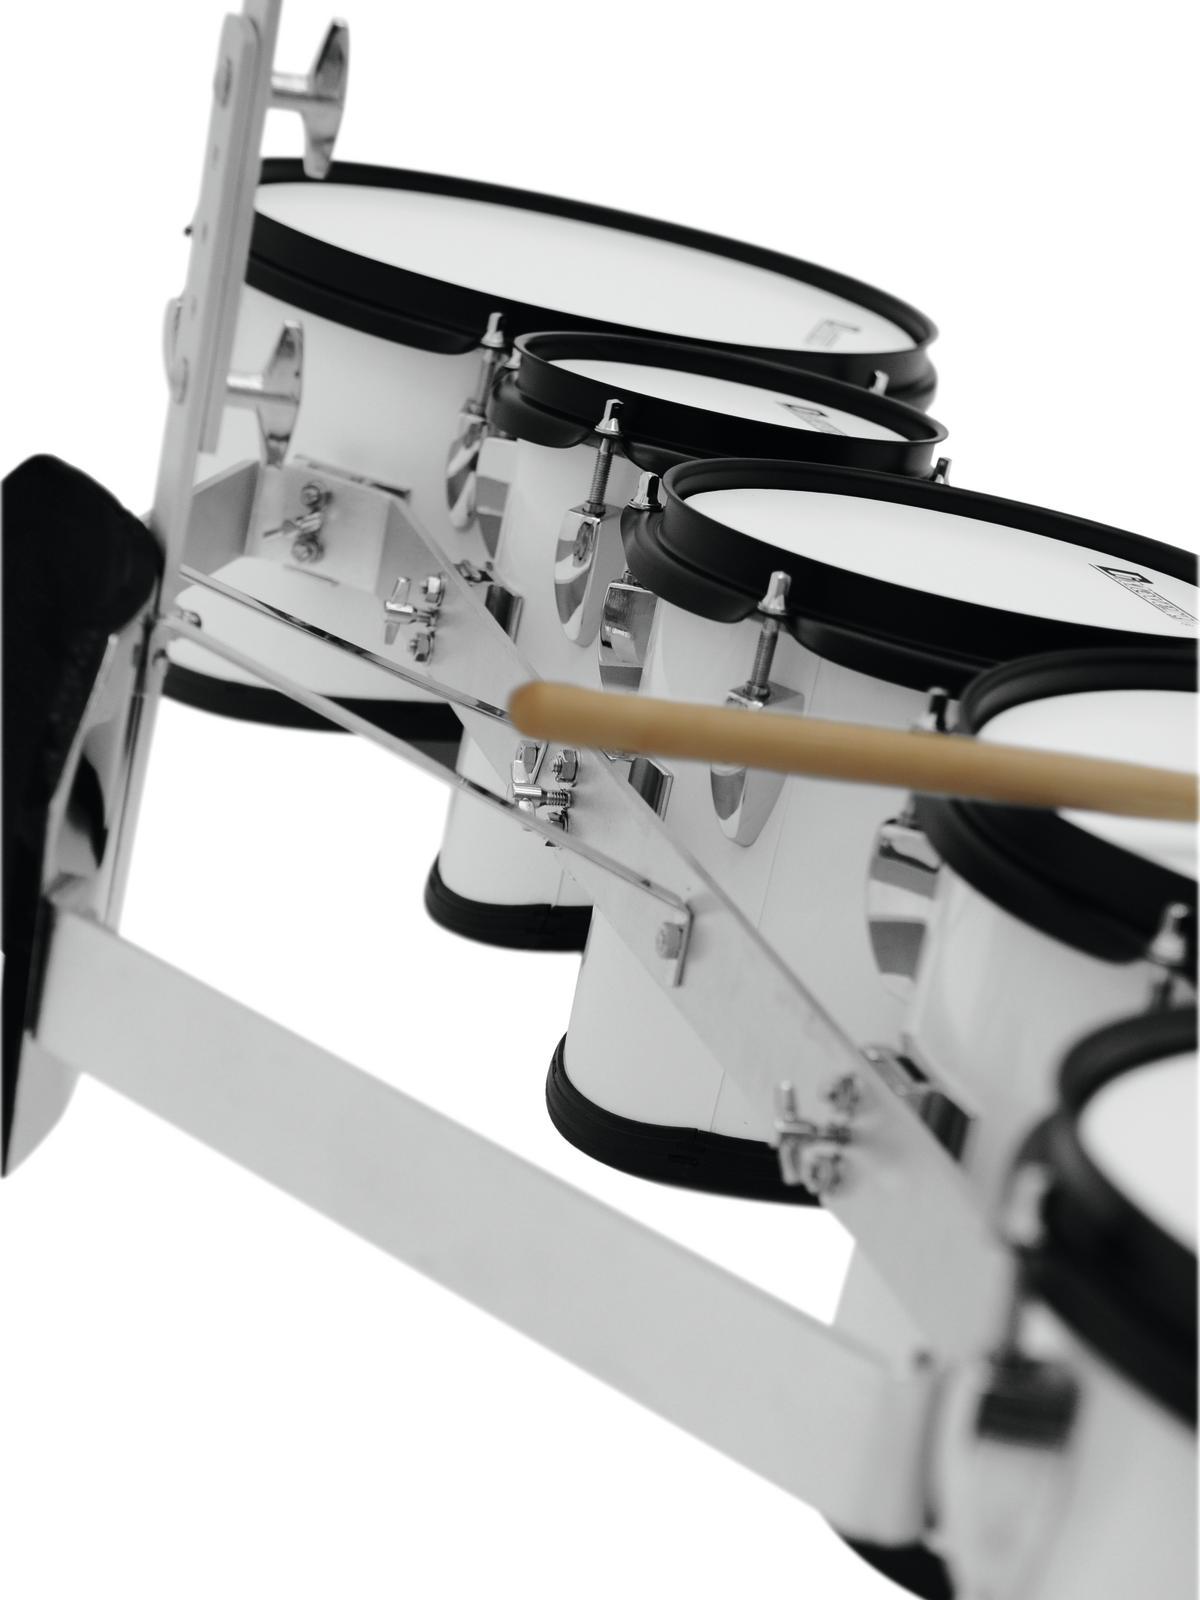 Drum-set da marcia per tamburi, bianco, DIMAVERY MT-530